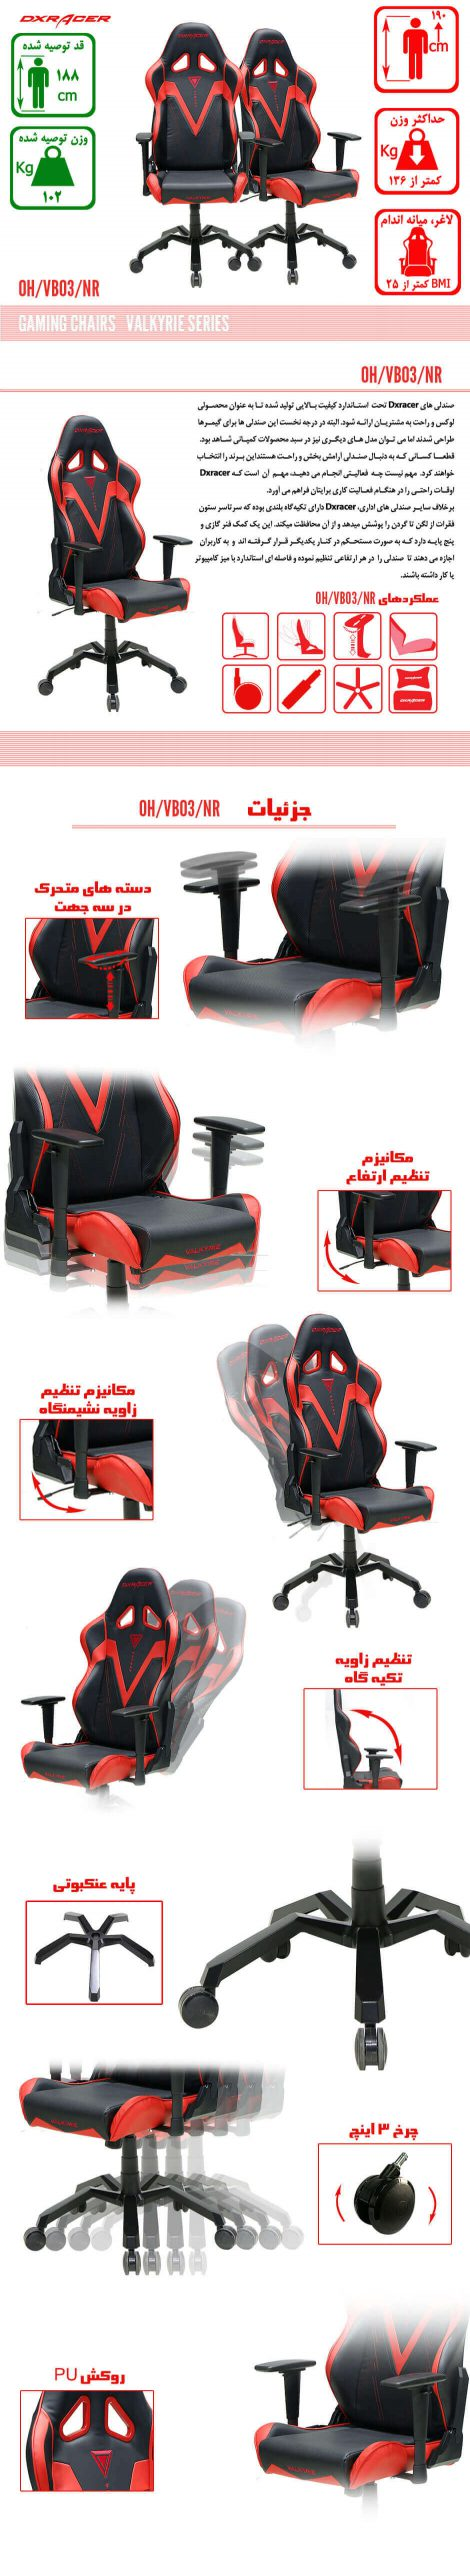 صندلی گیمینگ DXRACER سری والکری مدل OH VB03 NR